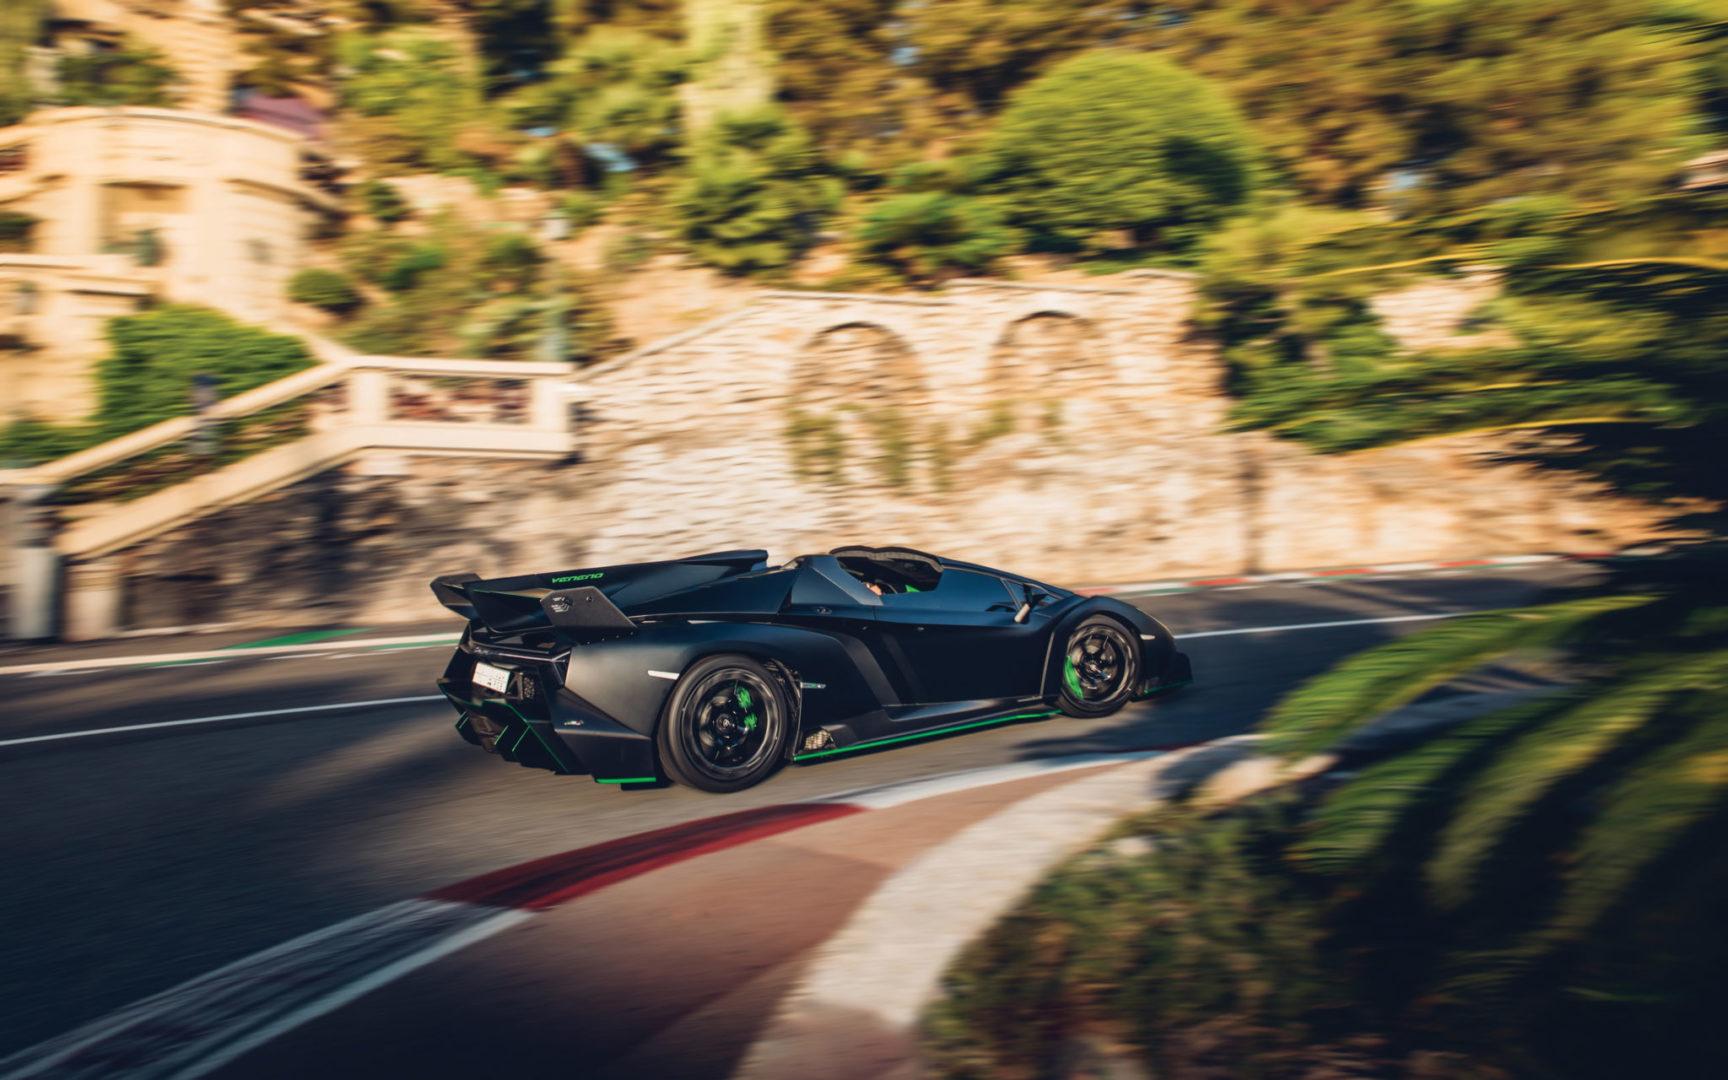 2015-Lamborghini-Veneno-Roadster-_14 (1)